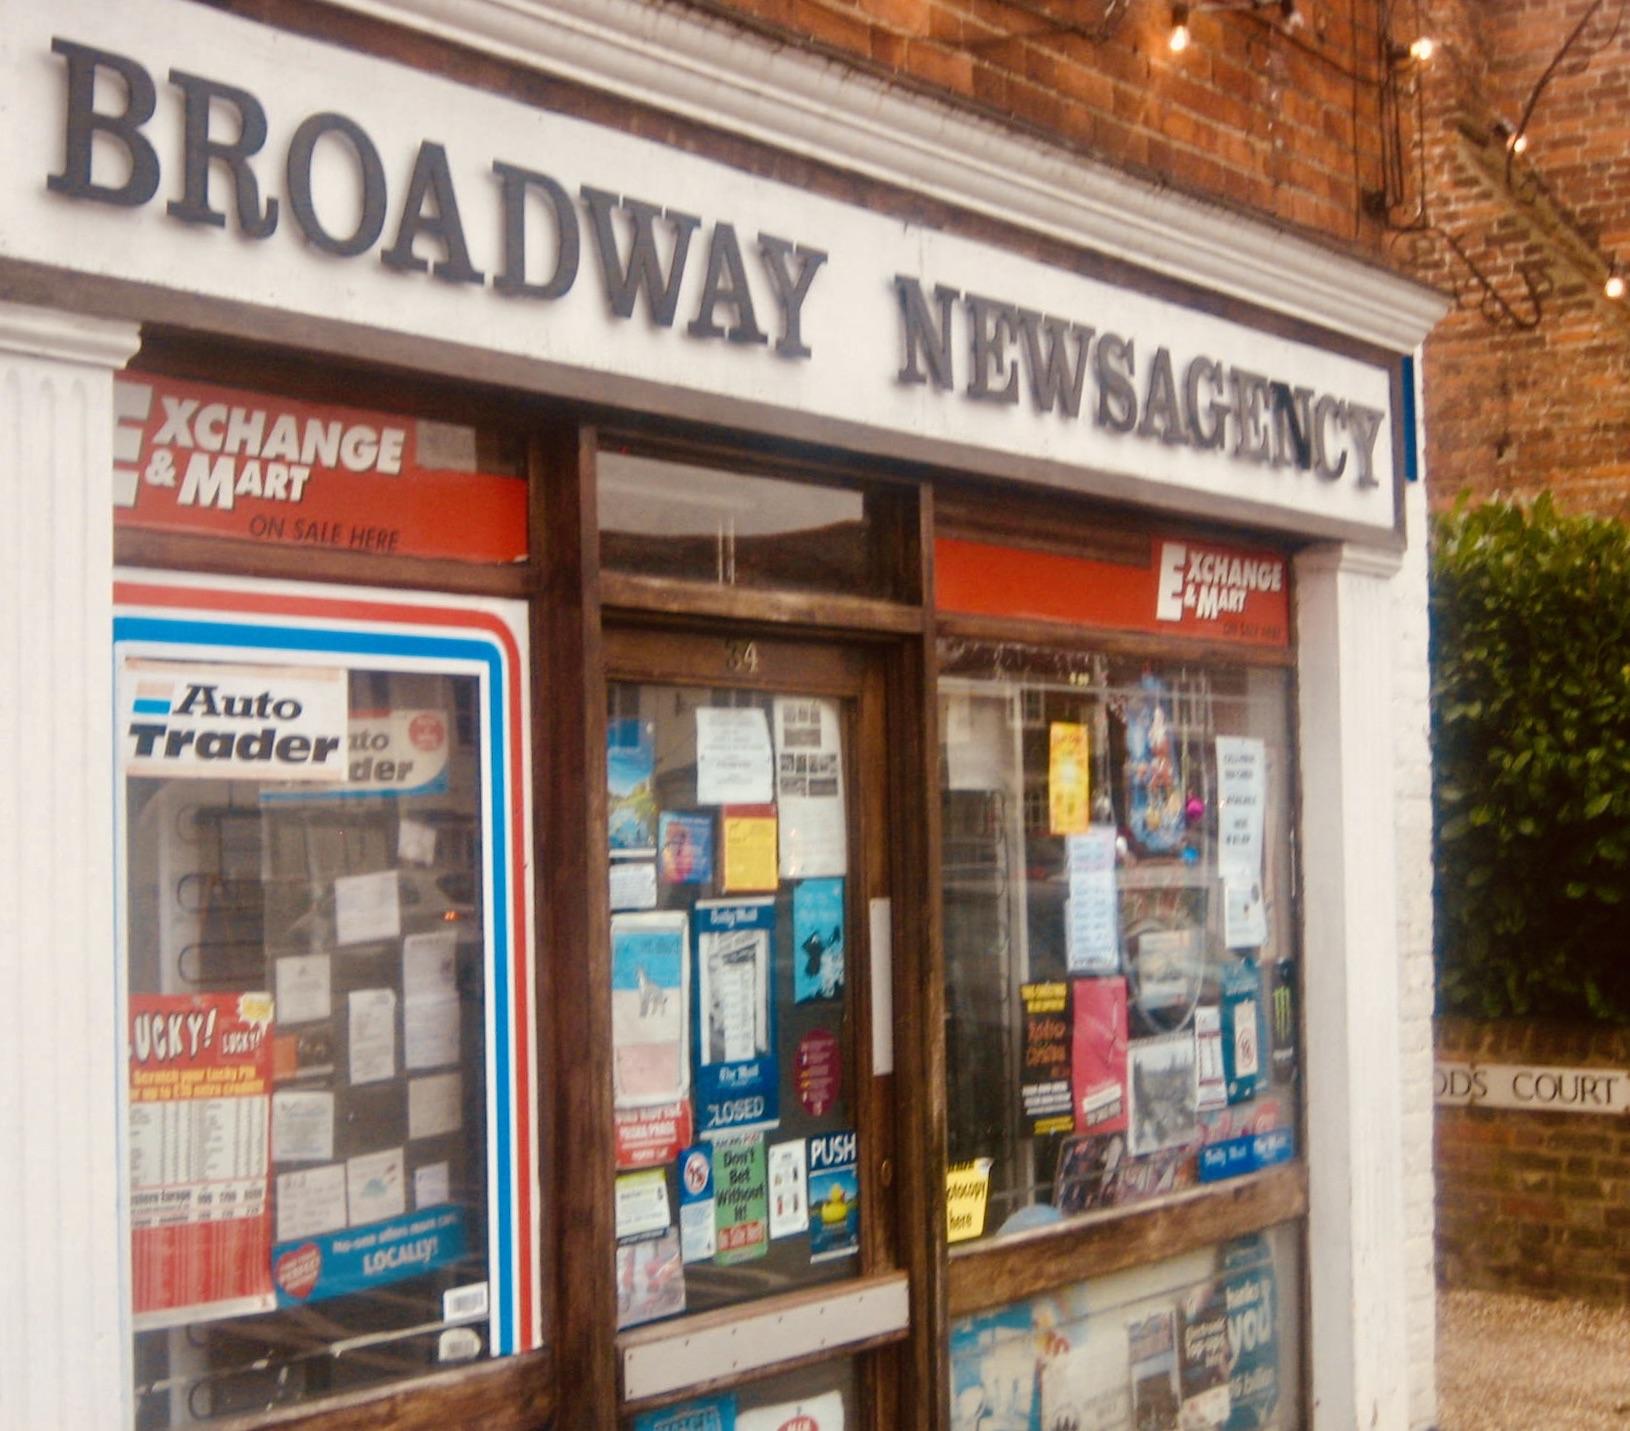 Broadway Newsagency Old Amersham.